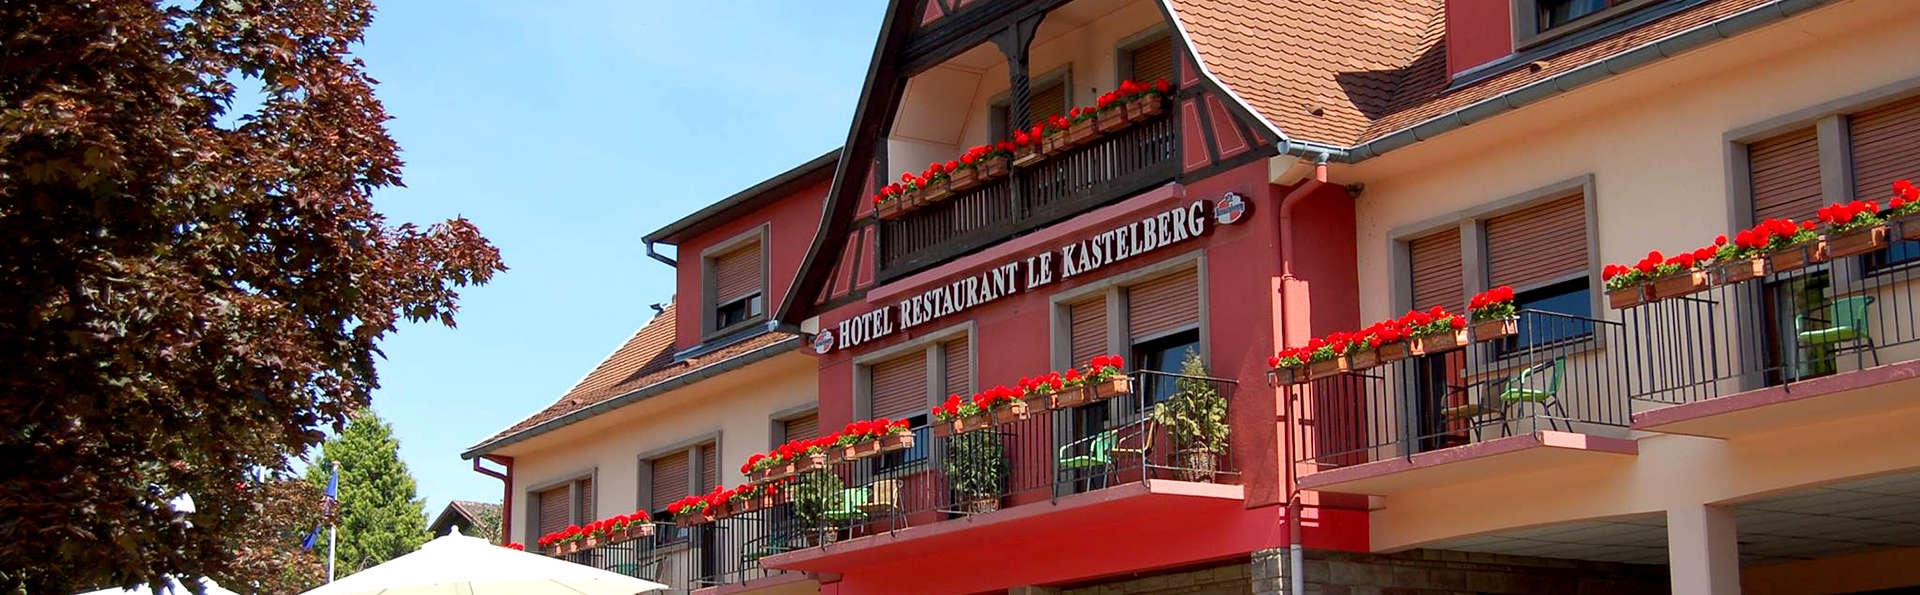 Hôtel Restaurant Le Kastelberg - Edit_Front.jpg